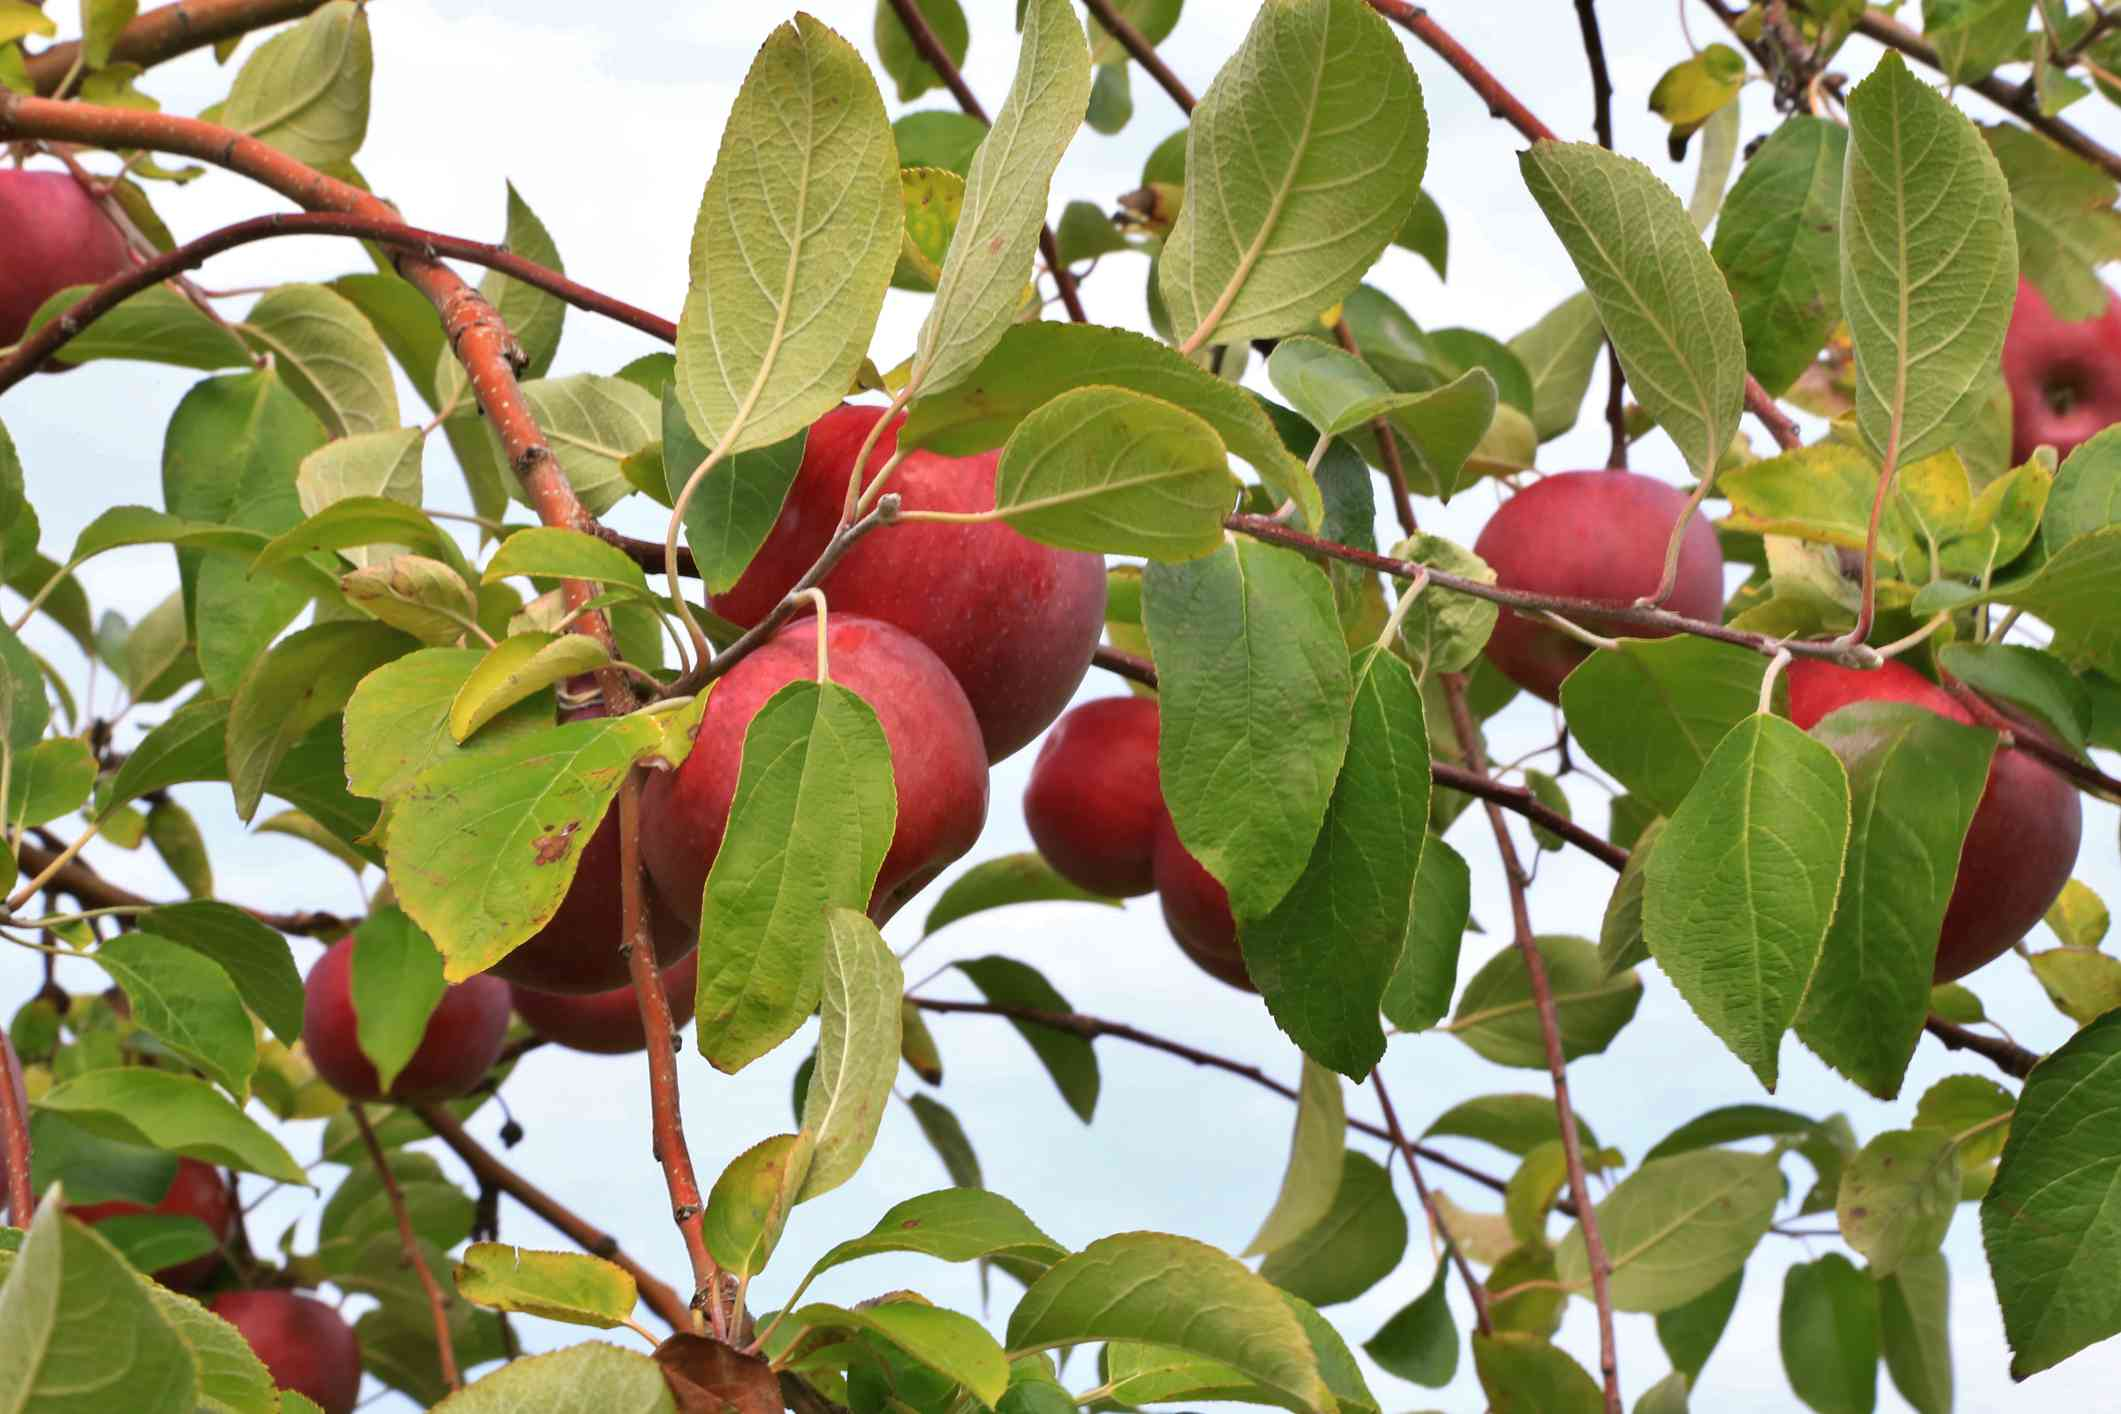 Jonathon Apples